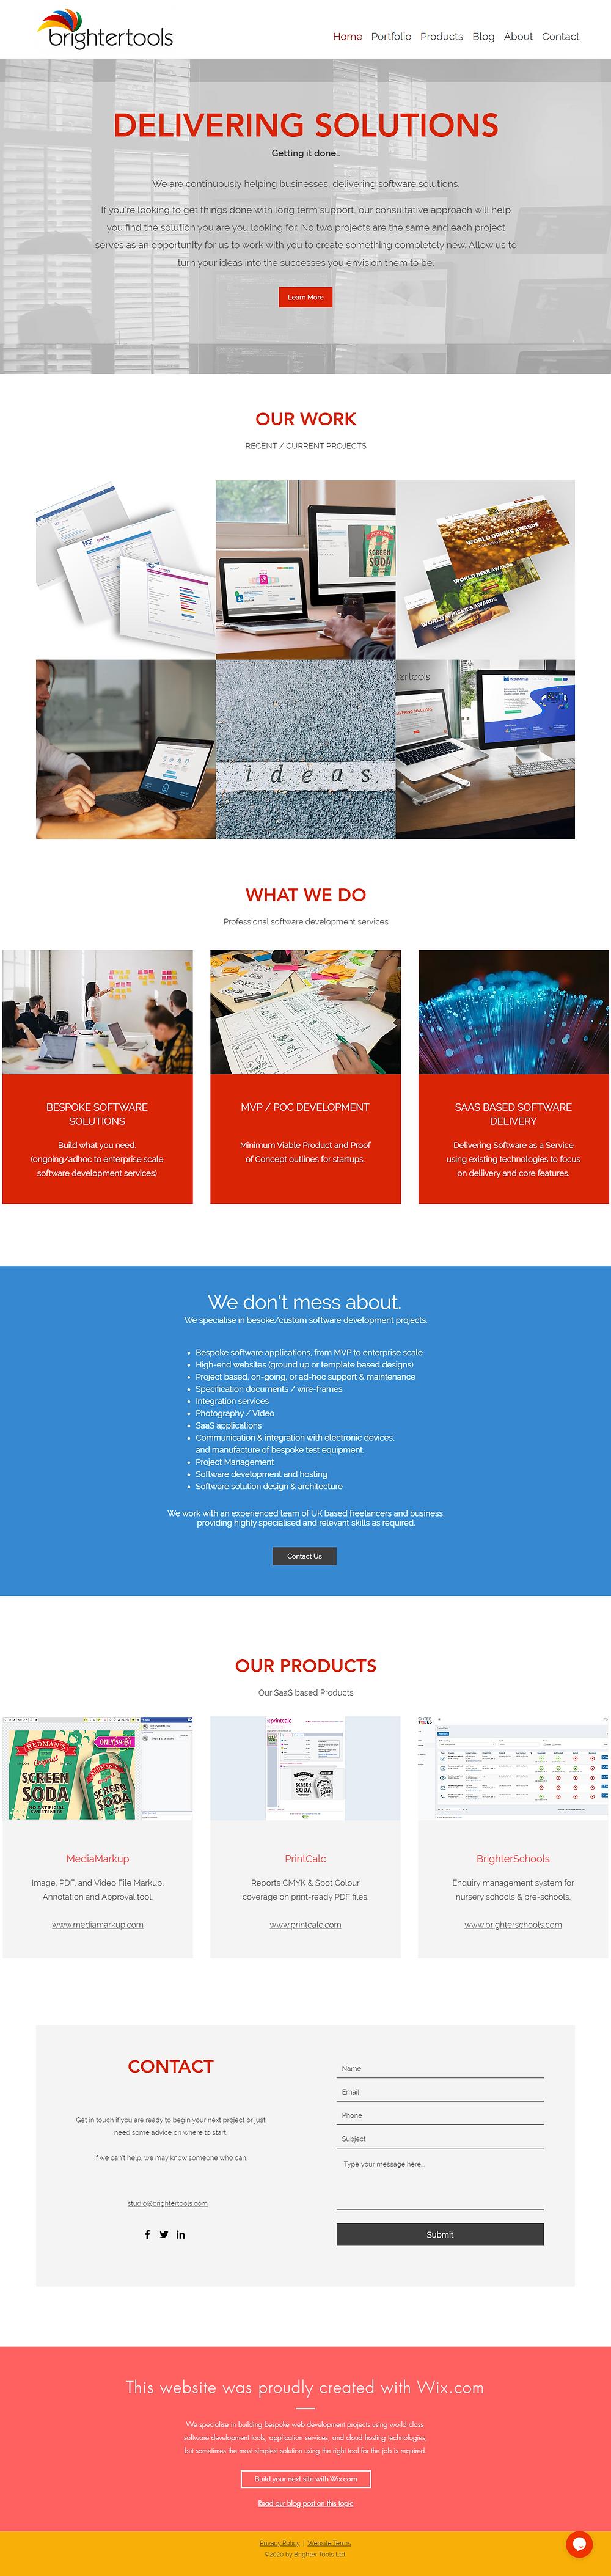 Screenshot of the Brighter Tools Website